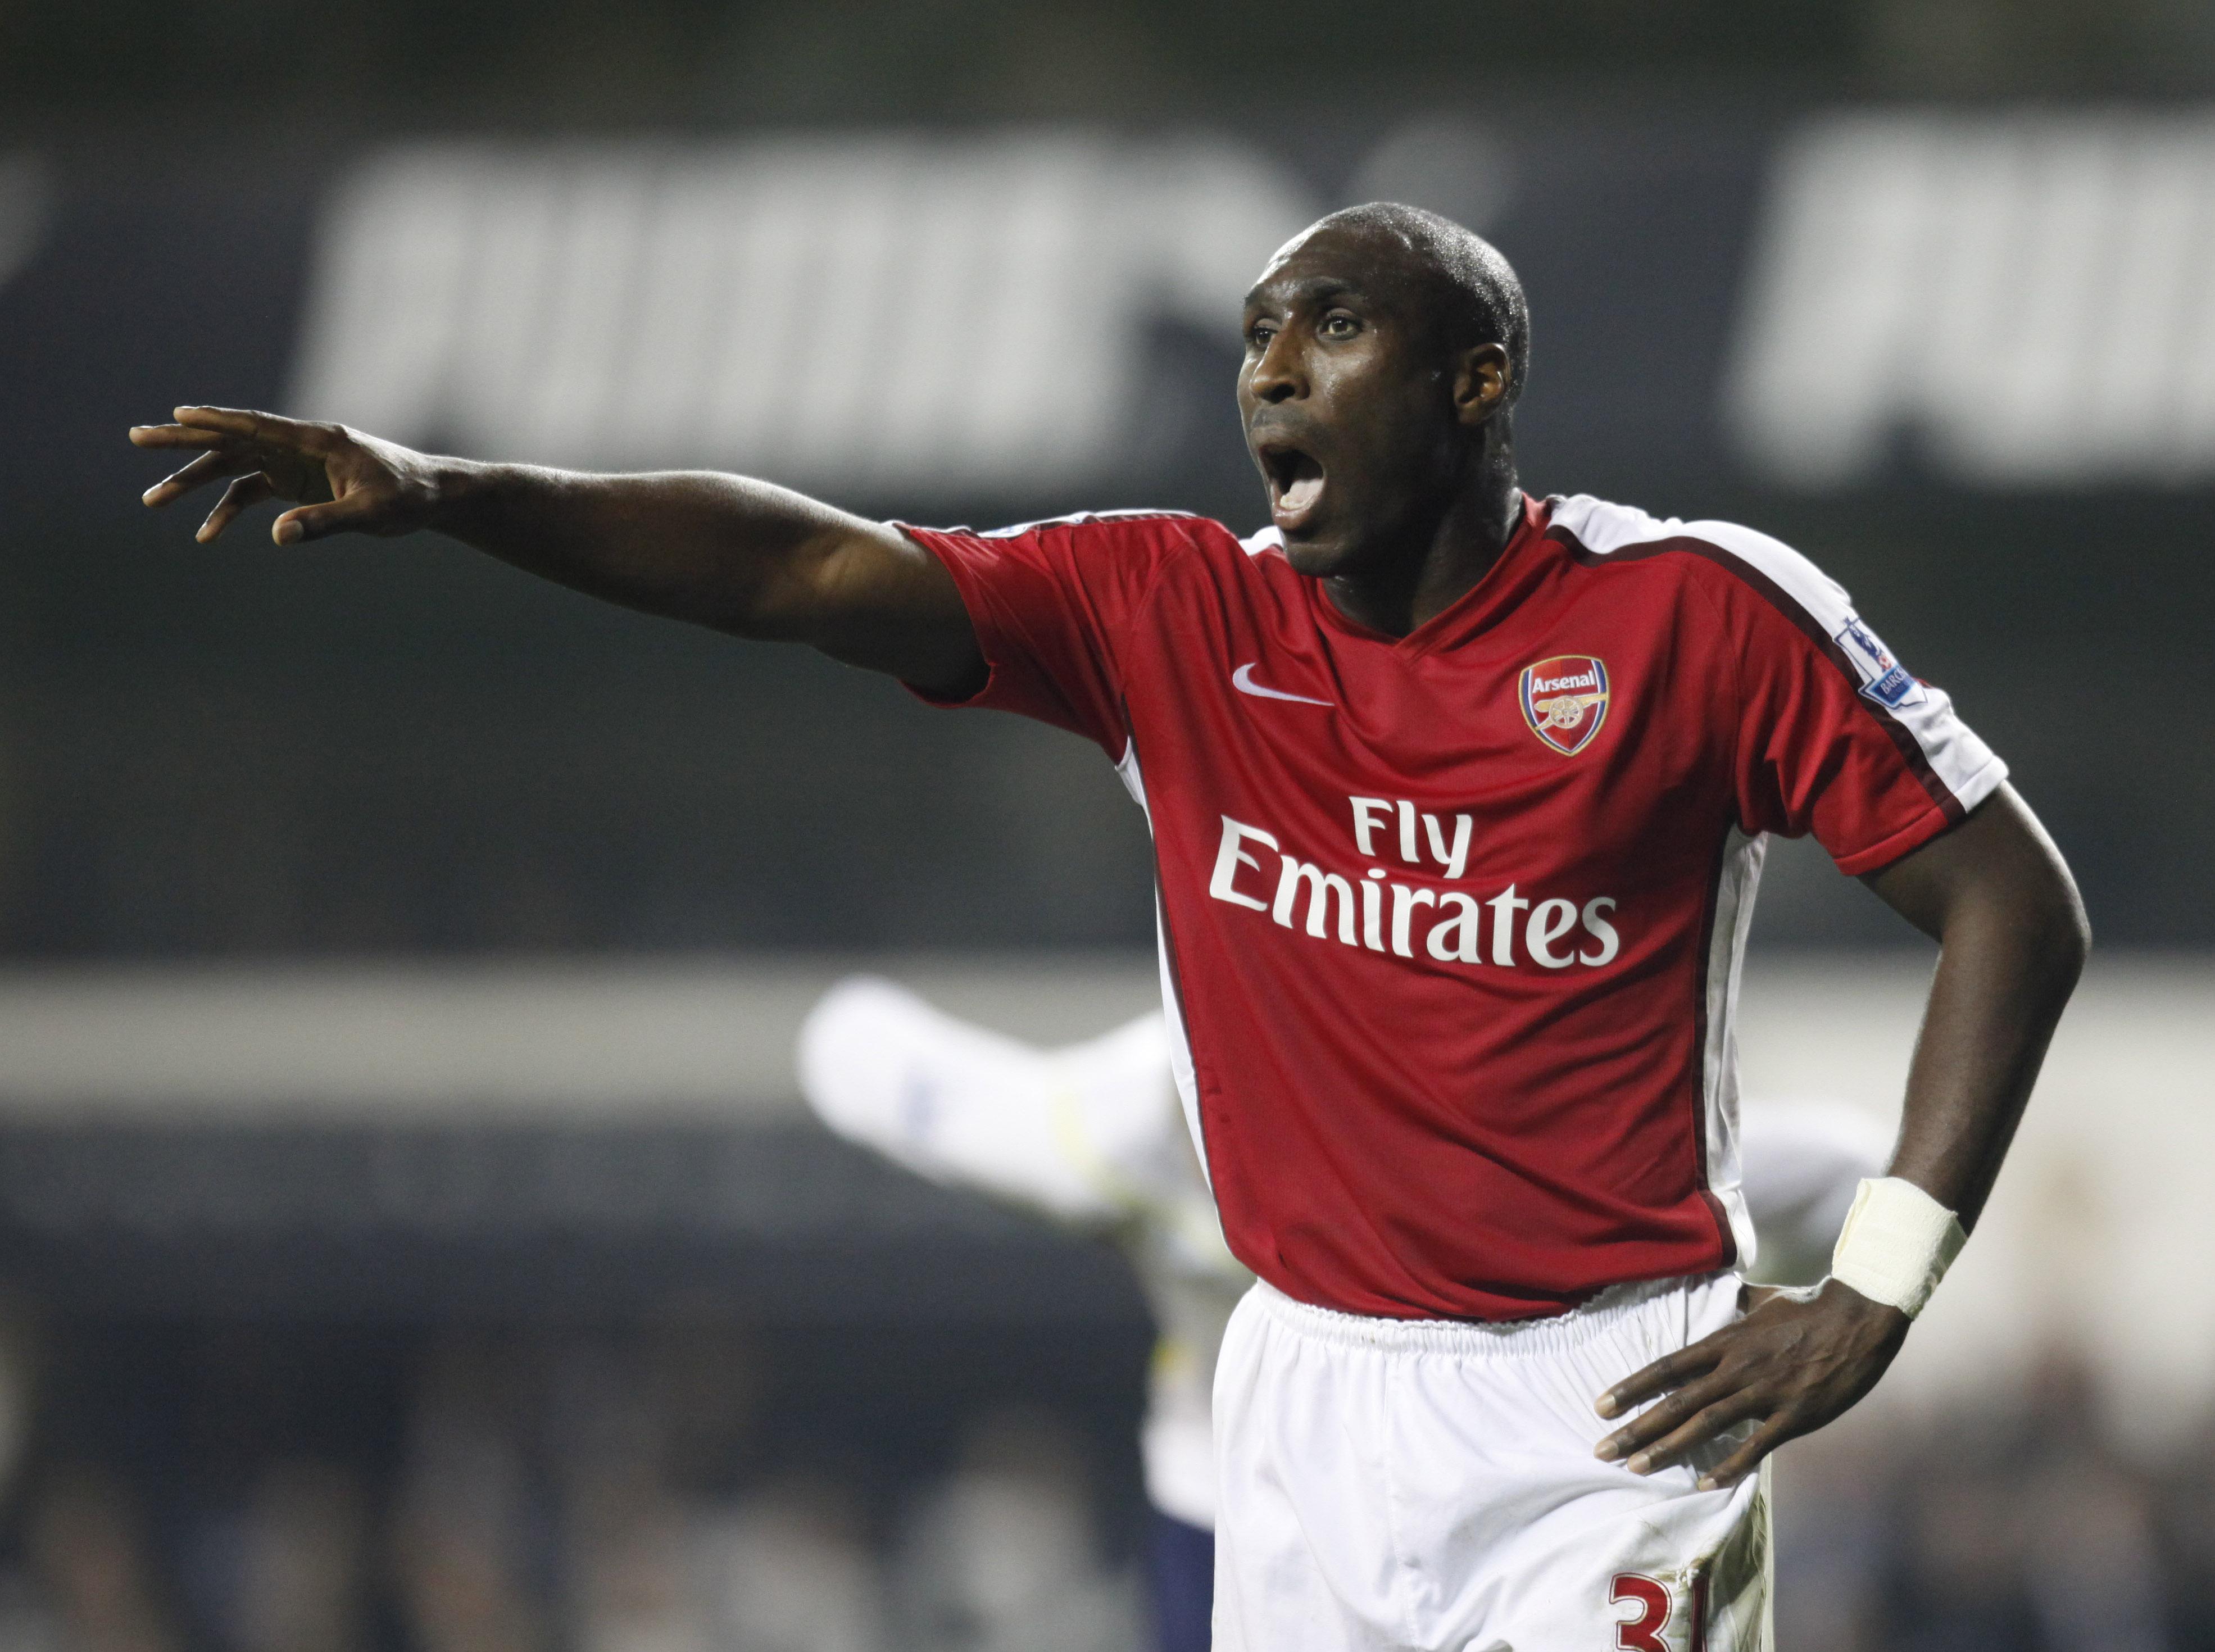 Arsenal legend Sol Campbell praises Laurent Koscielny and Shkodran Mustafi partnership